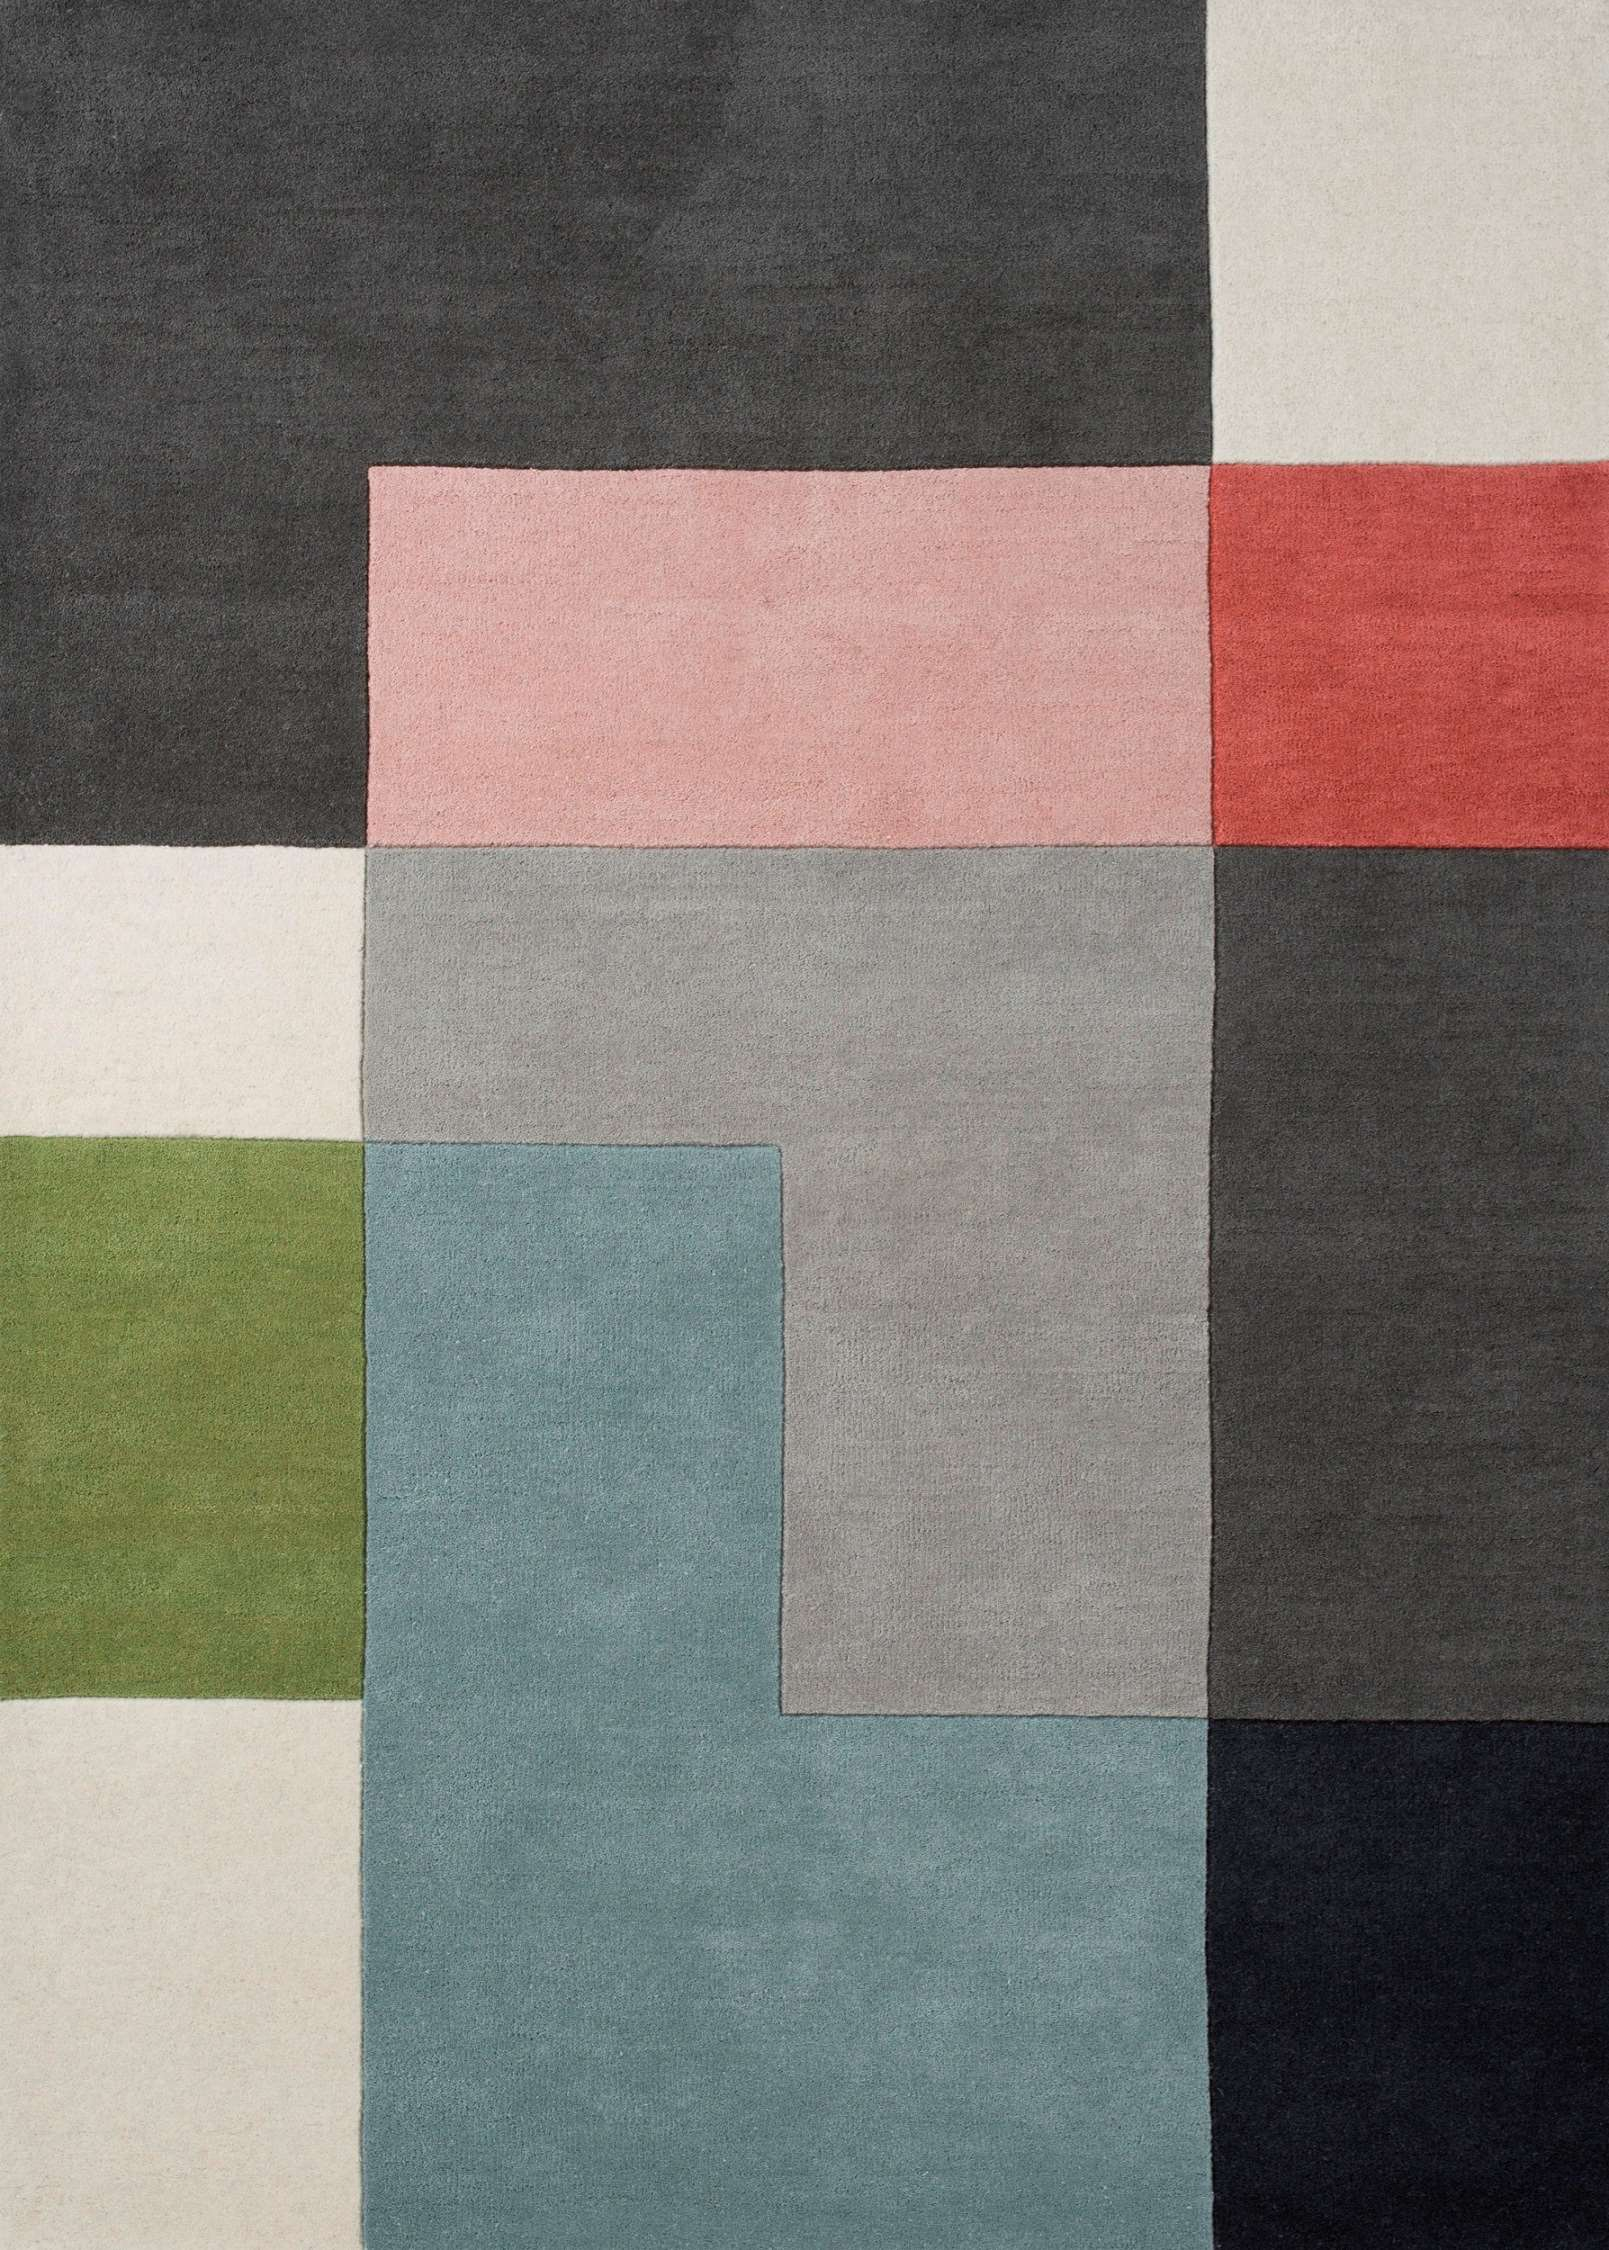 Splinterny Tetris Powder tæppe fra Linie Design - Ullmans Mattor SZ82